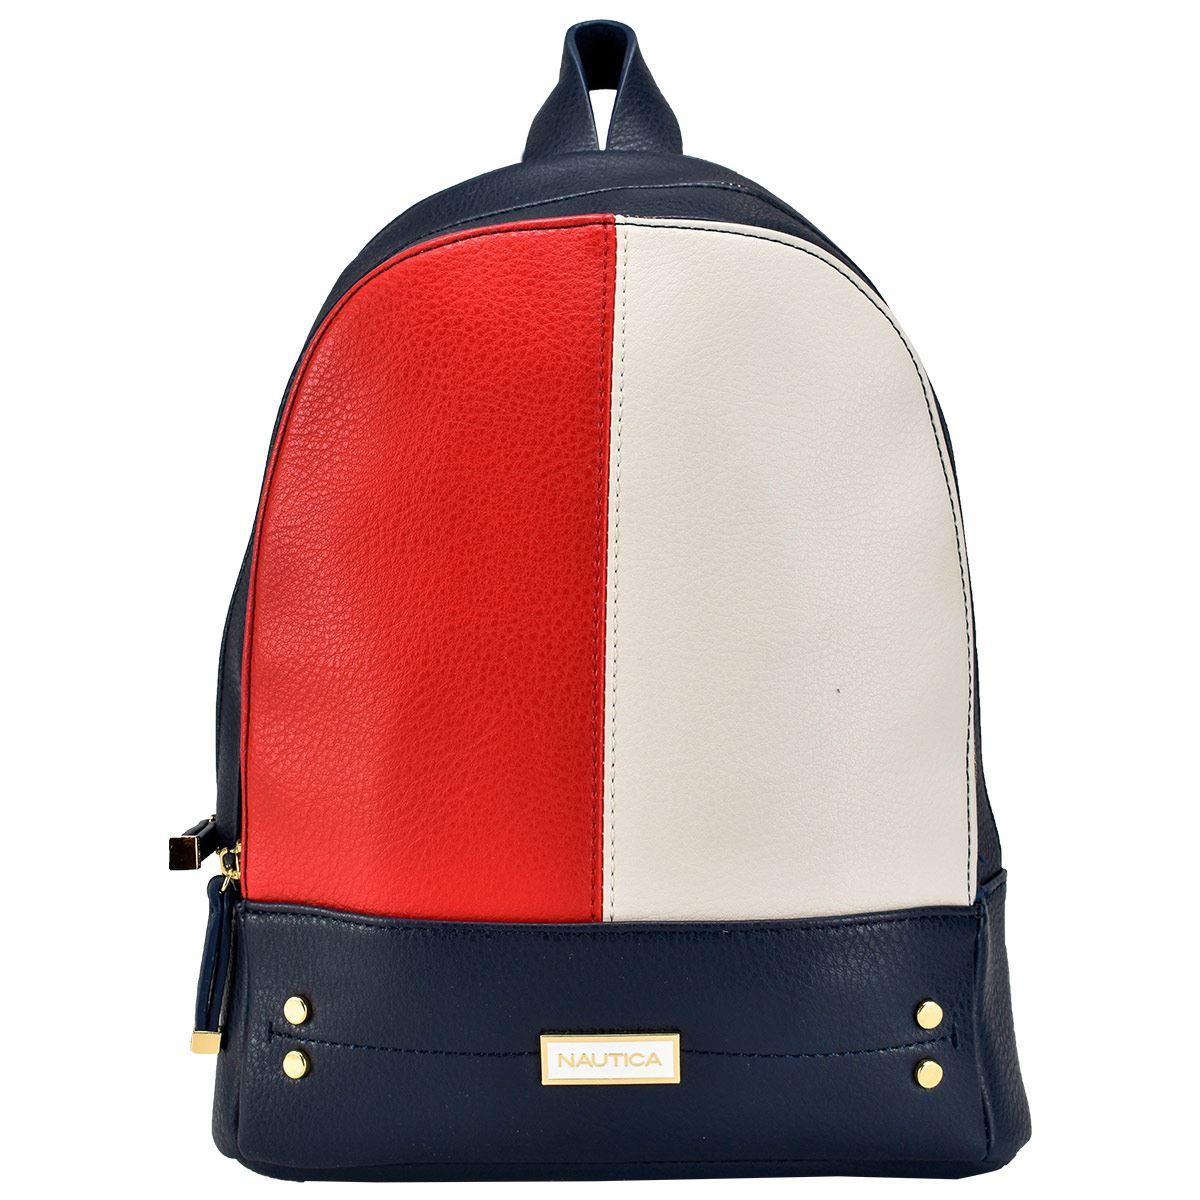 Bolso Back Pack Nautica Rojo/ Blanco